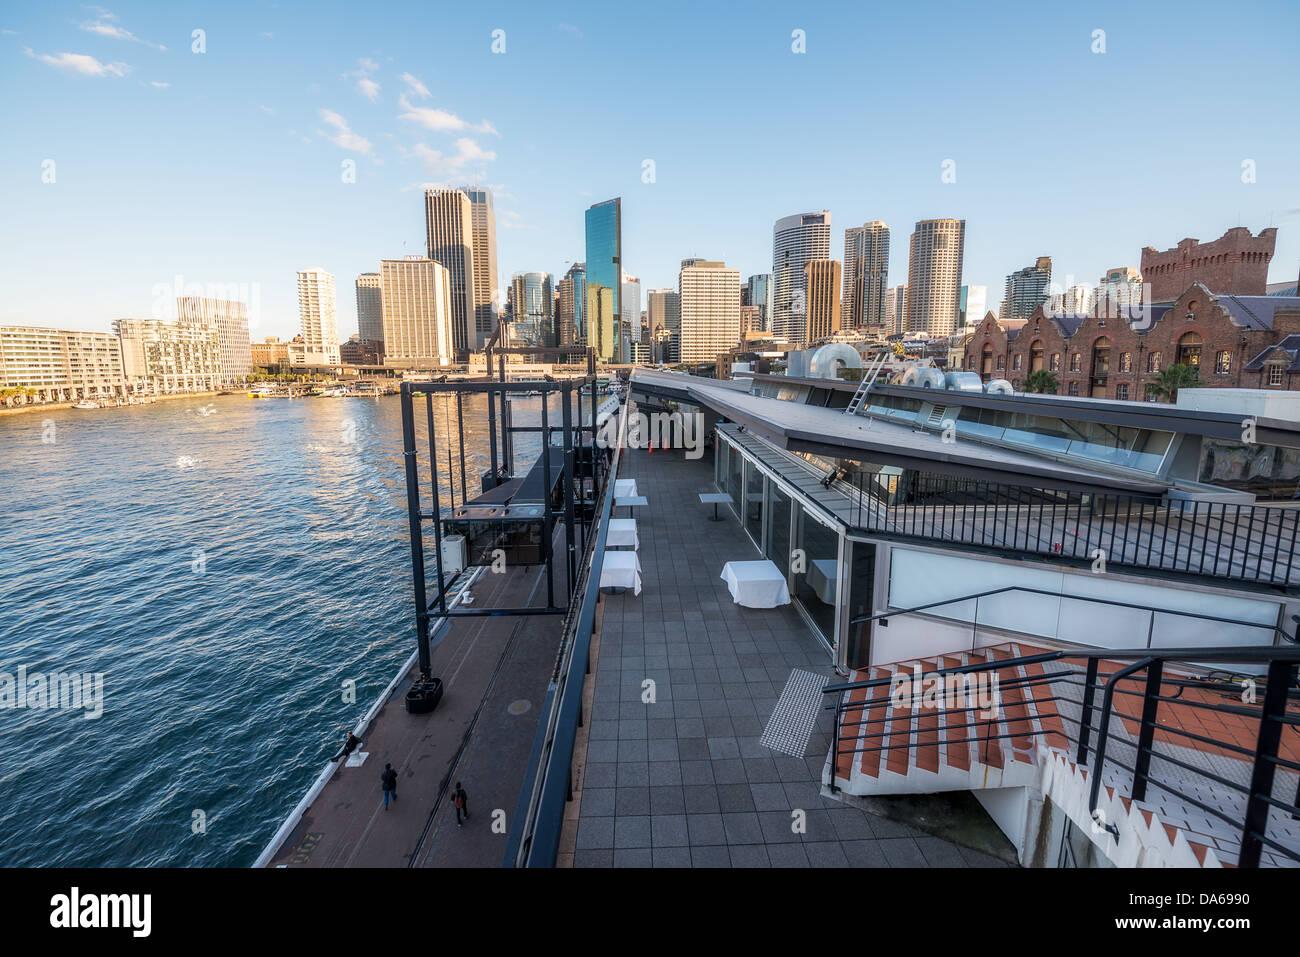 The Overseas Passenger Terminal near Circular Quay Sydney. - Stock Image